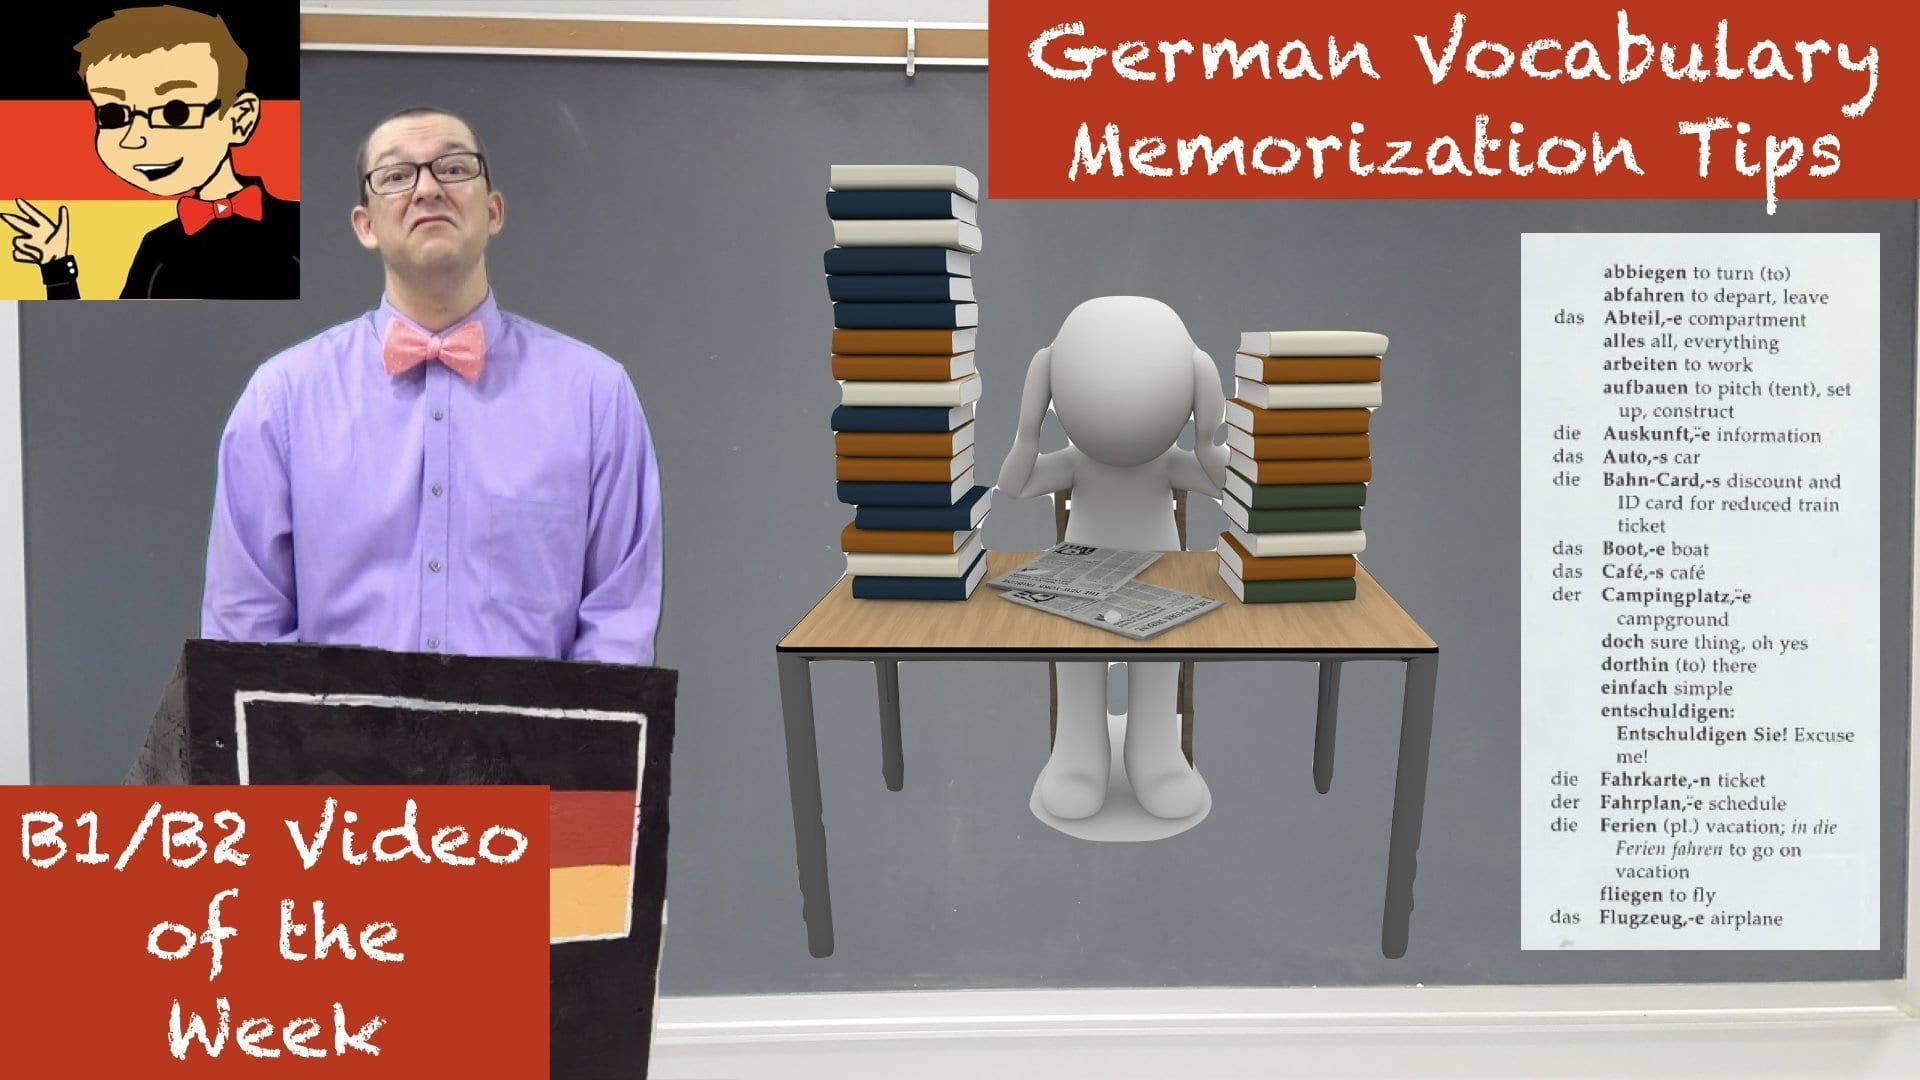 German Vocabulary Memorization Tips